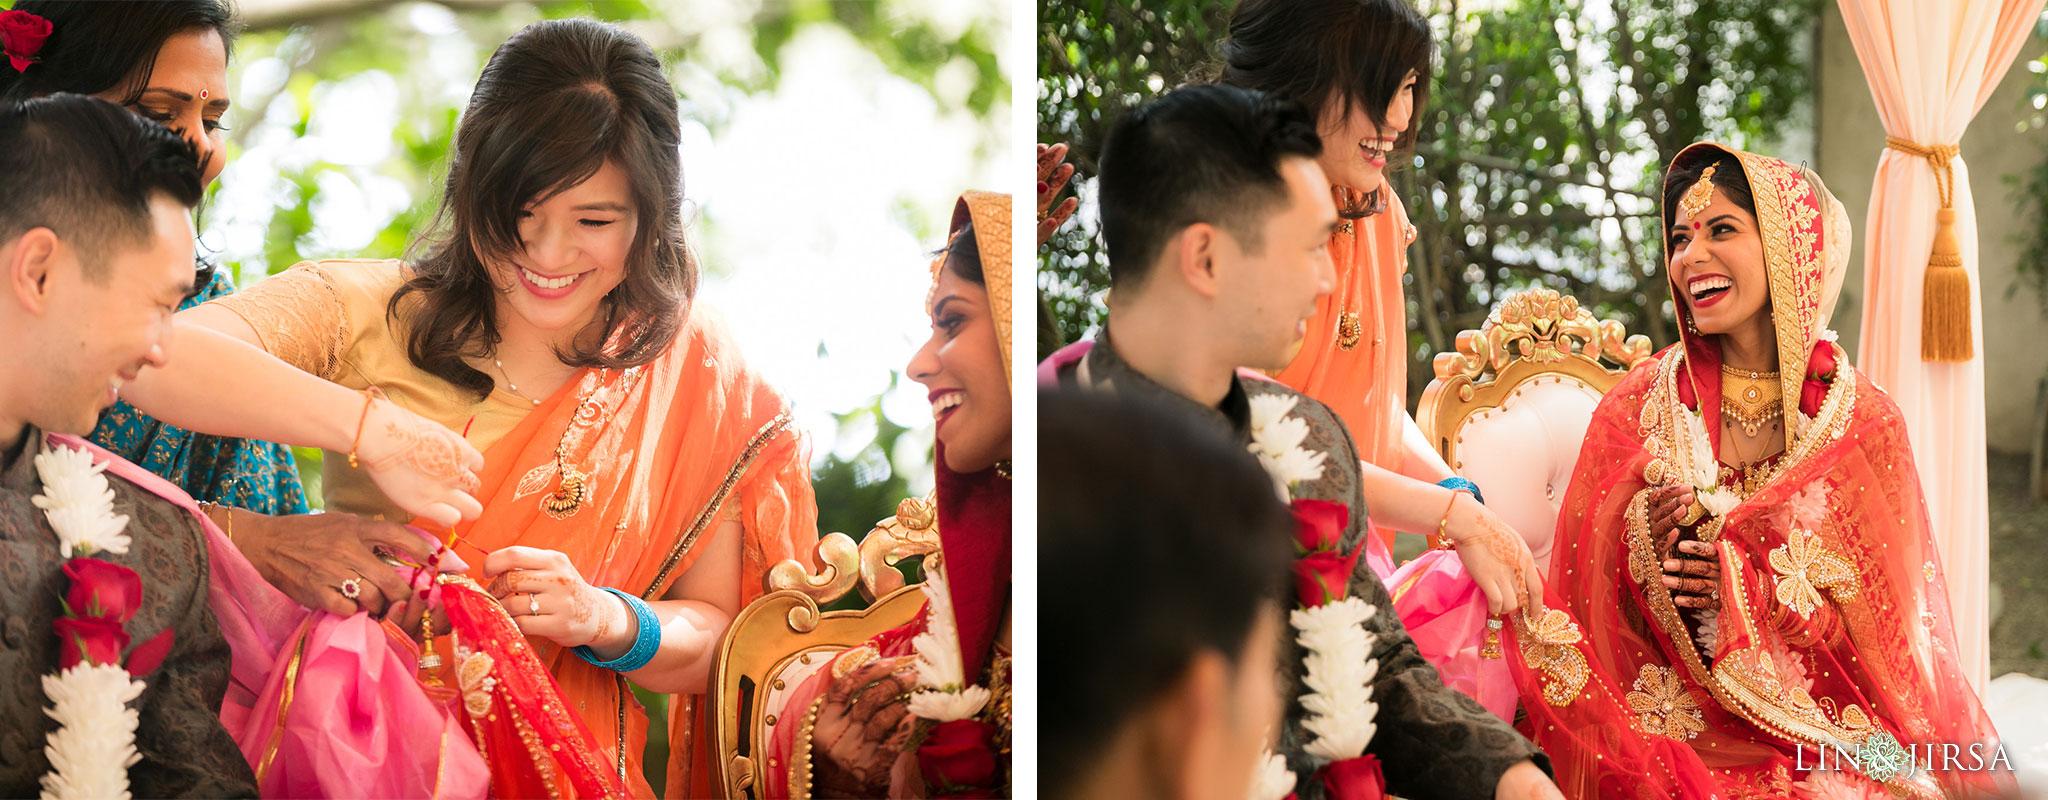 46 sportsmens lodge studio city indian wedding ceremony photography